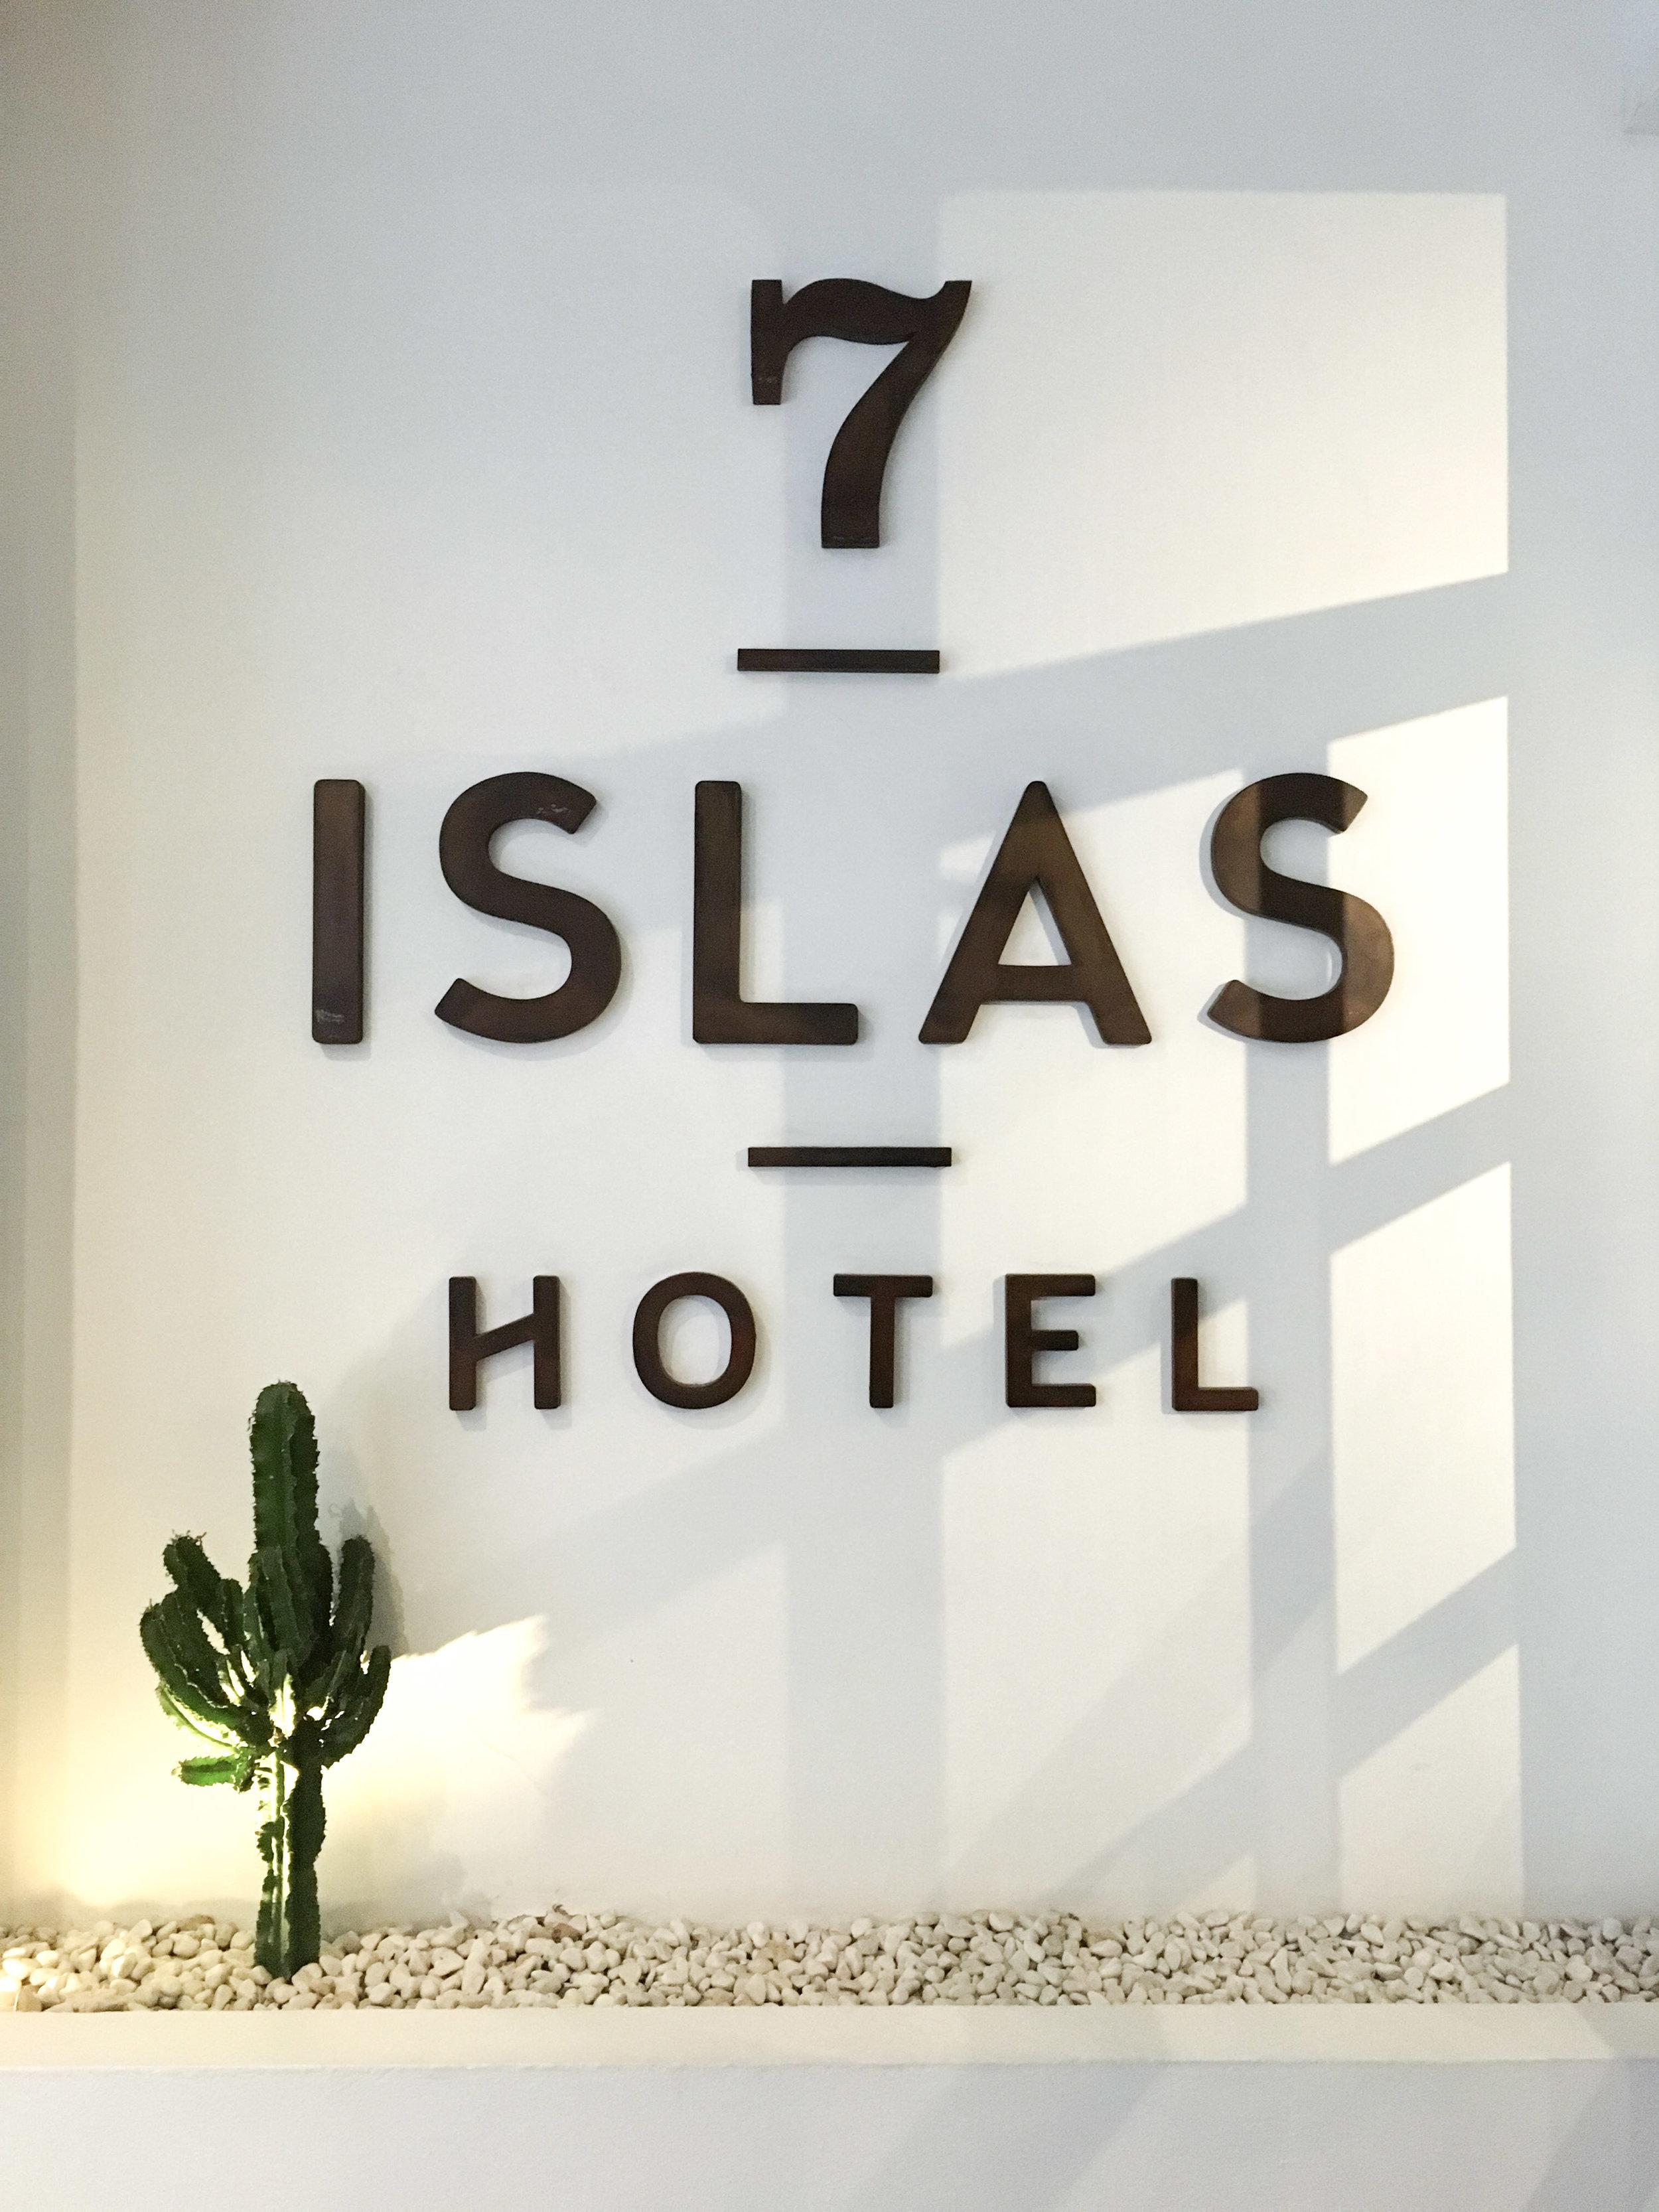 7-islas-hotel-madrid.jpg